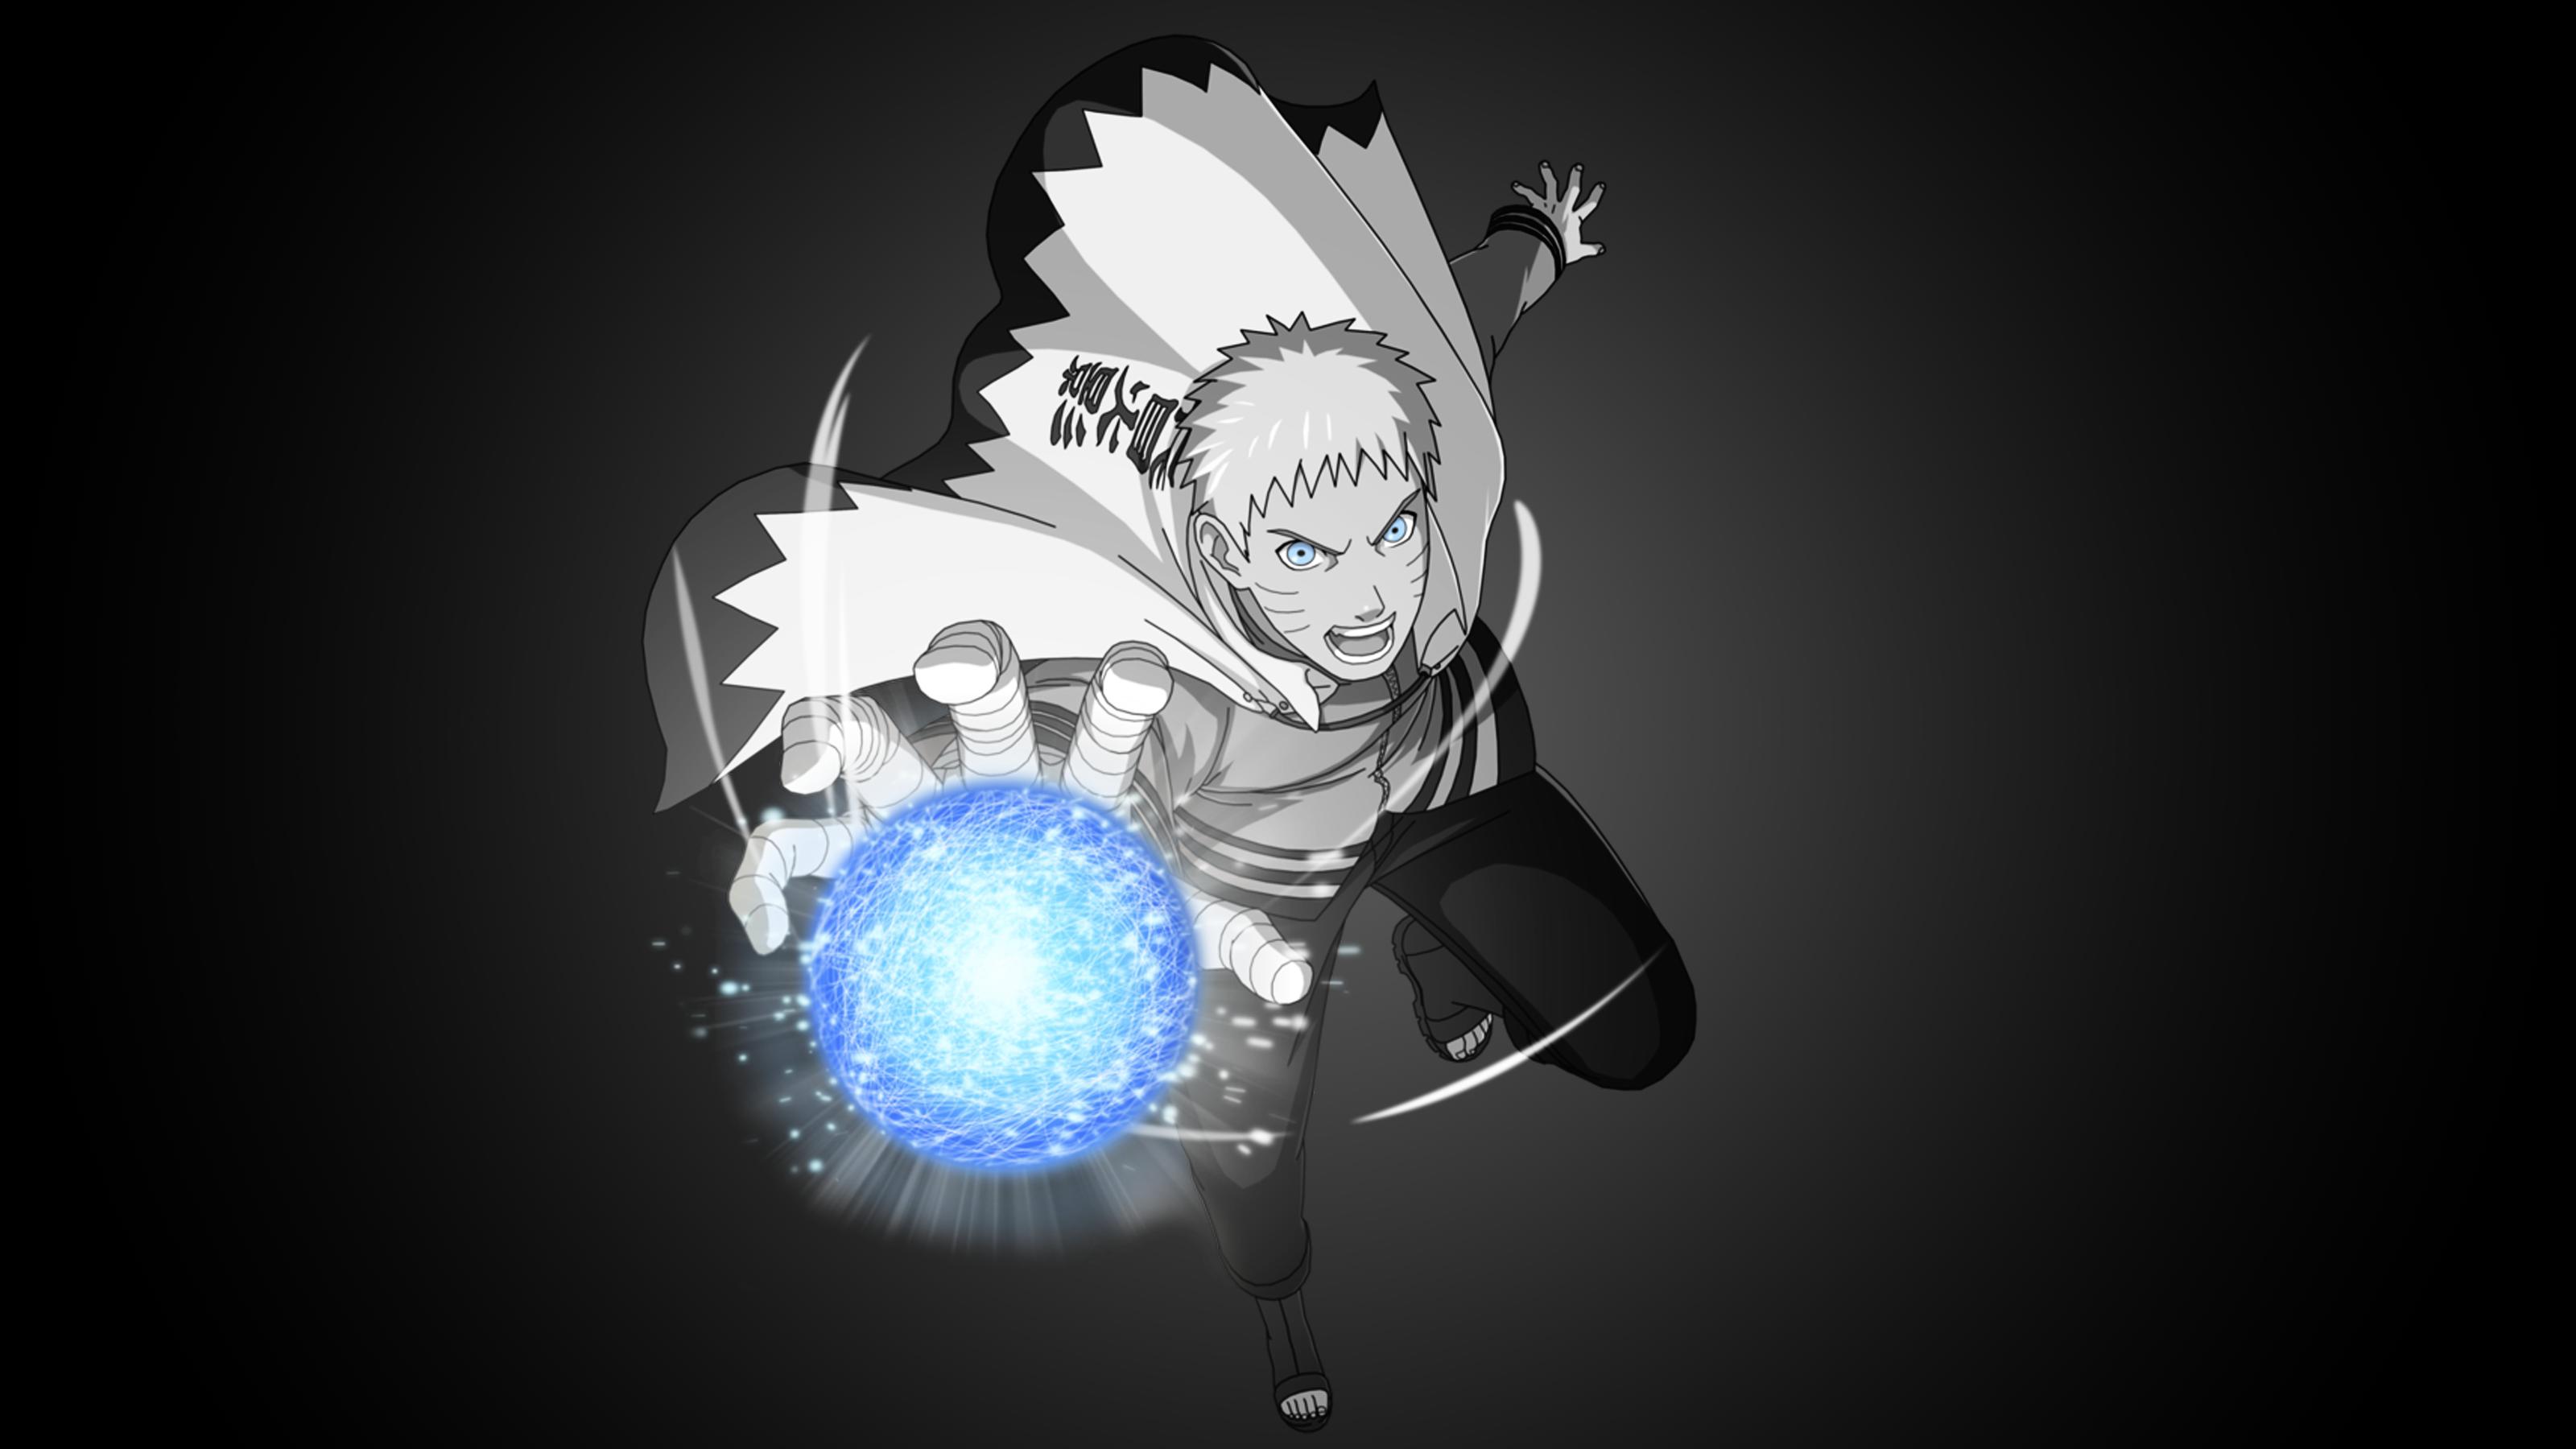 Naruto Rasengan Full HD Wallpaper And Background Image